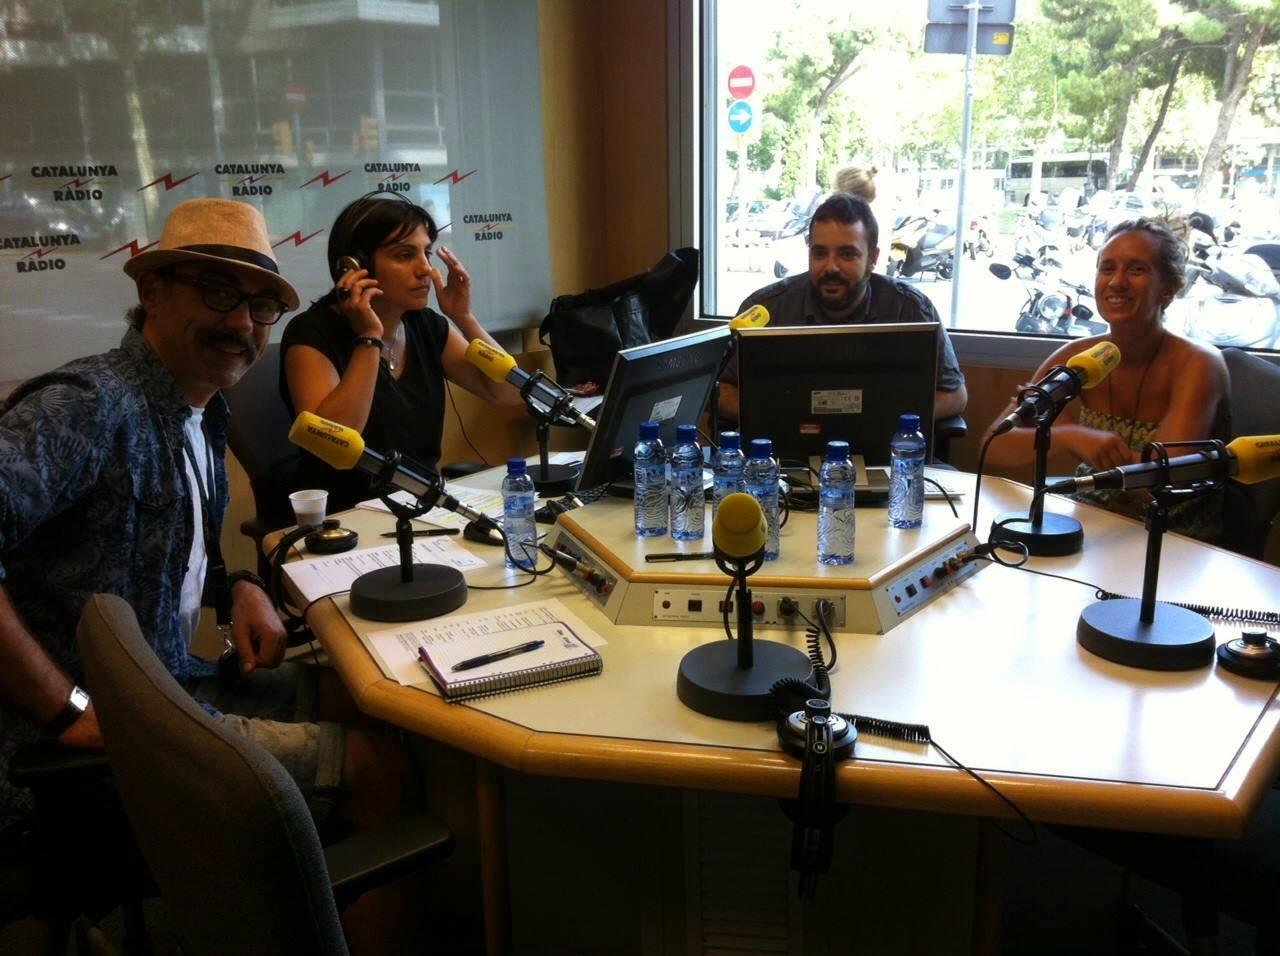 8 dies, entrevista, Catalunya Radio, Casamitjana 15, Mejor en casa